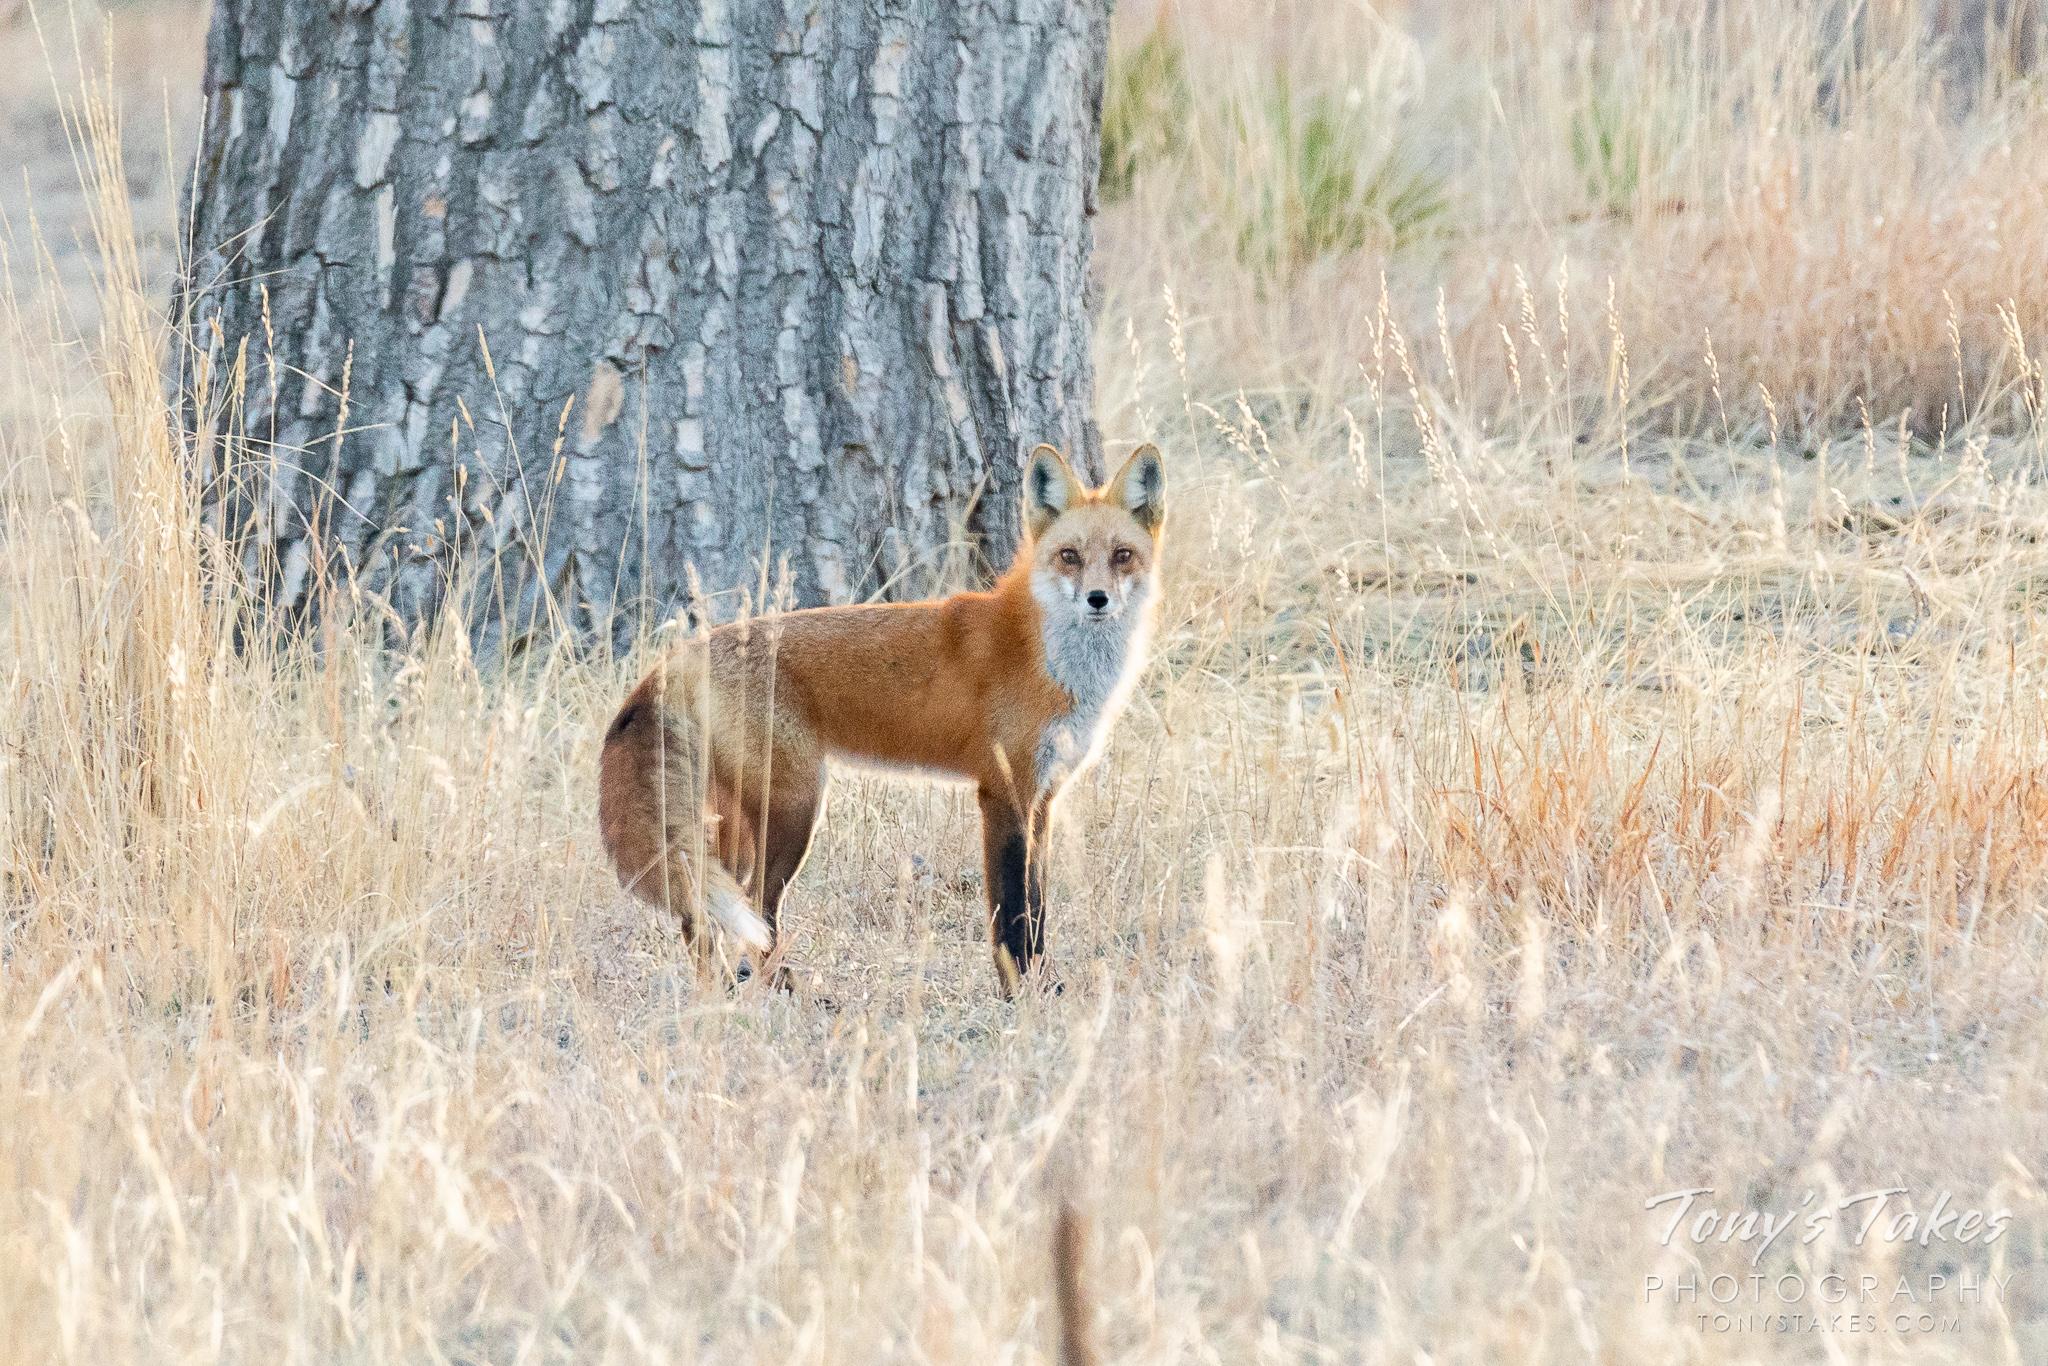 Longshot fox